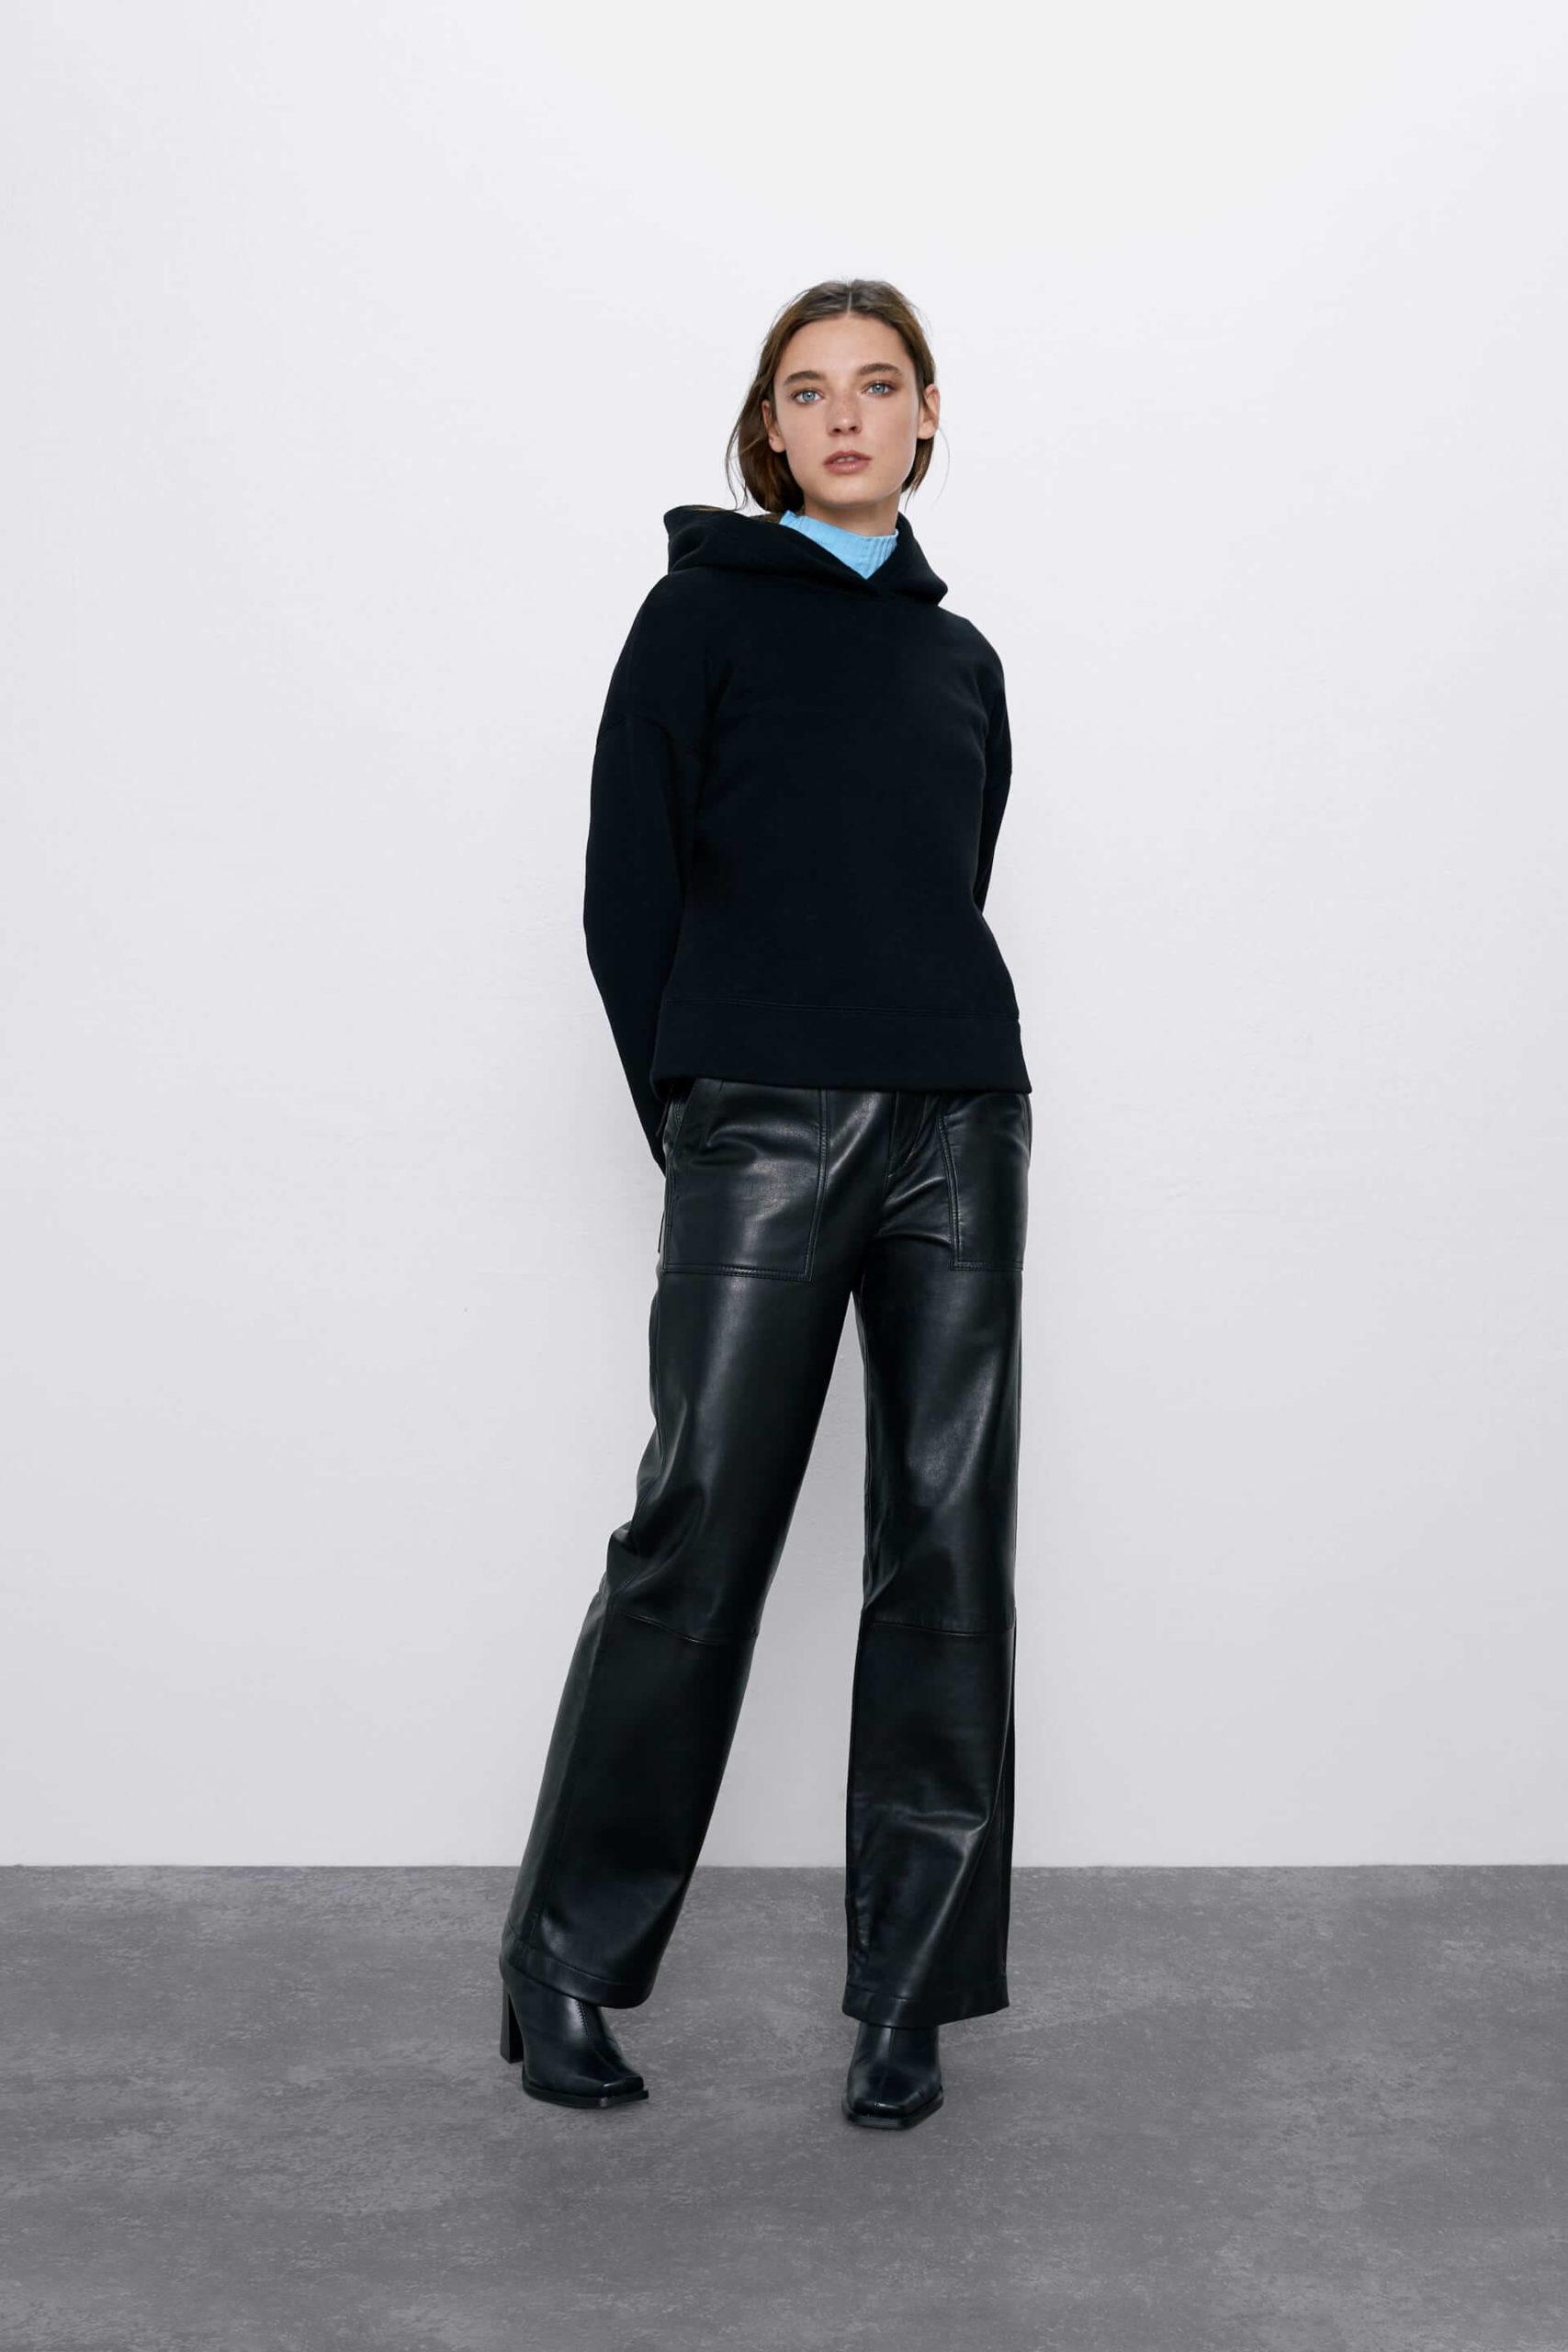 Zara kapüşonlu sweatshirt kadın